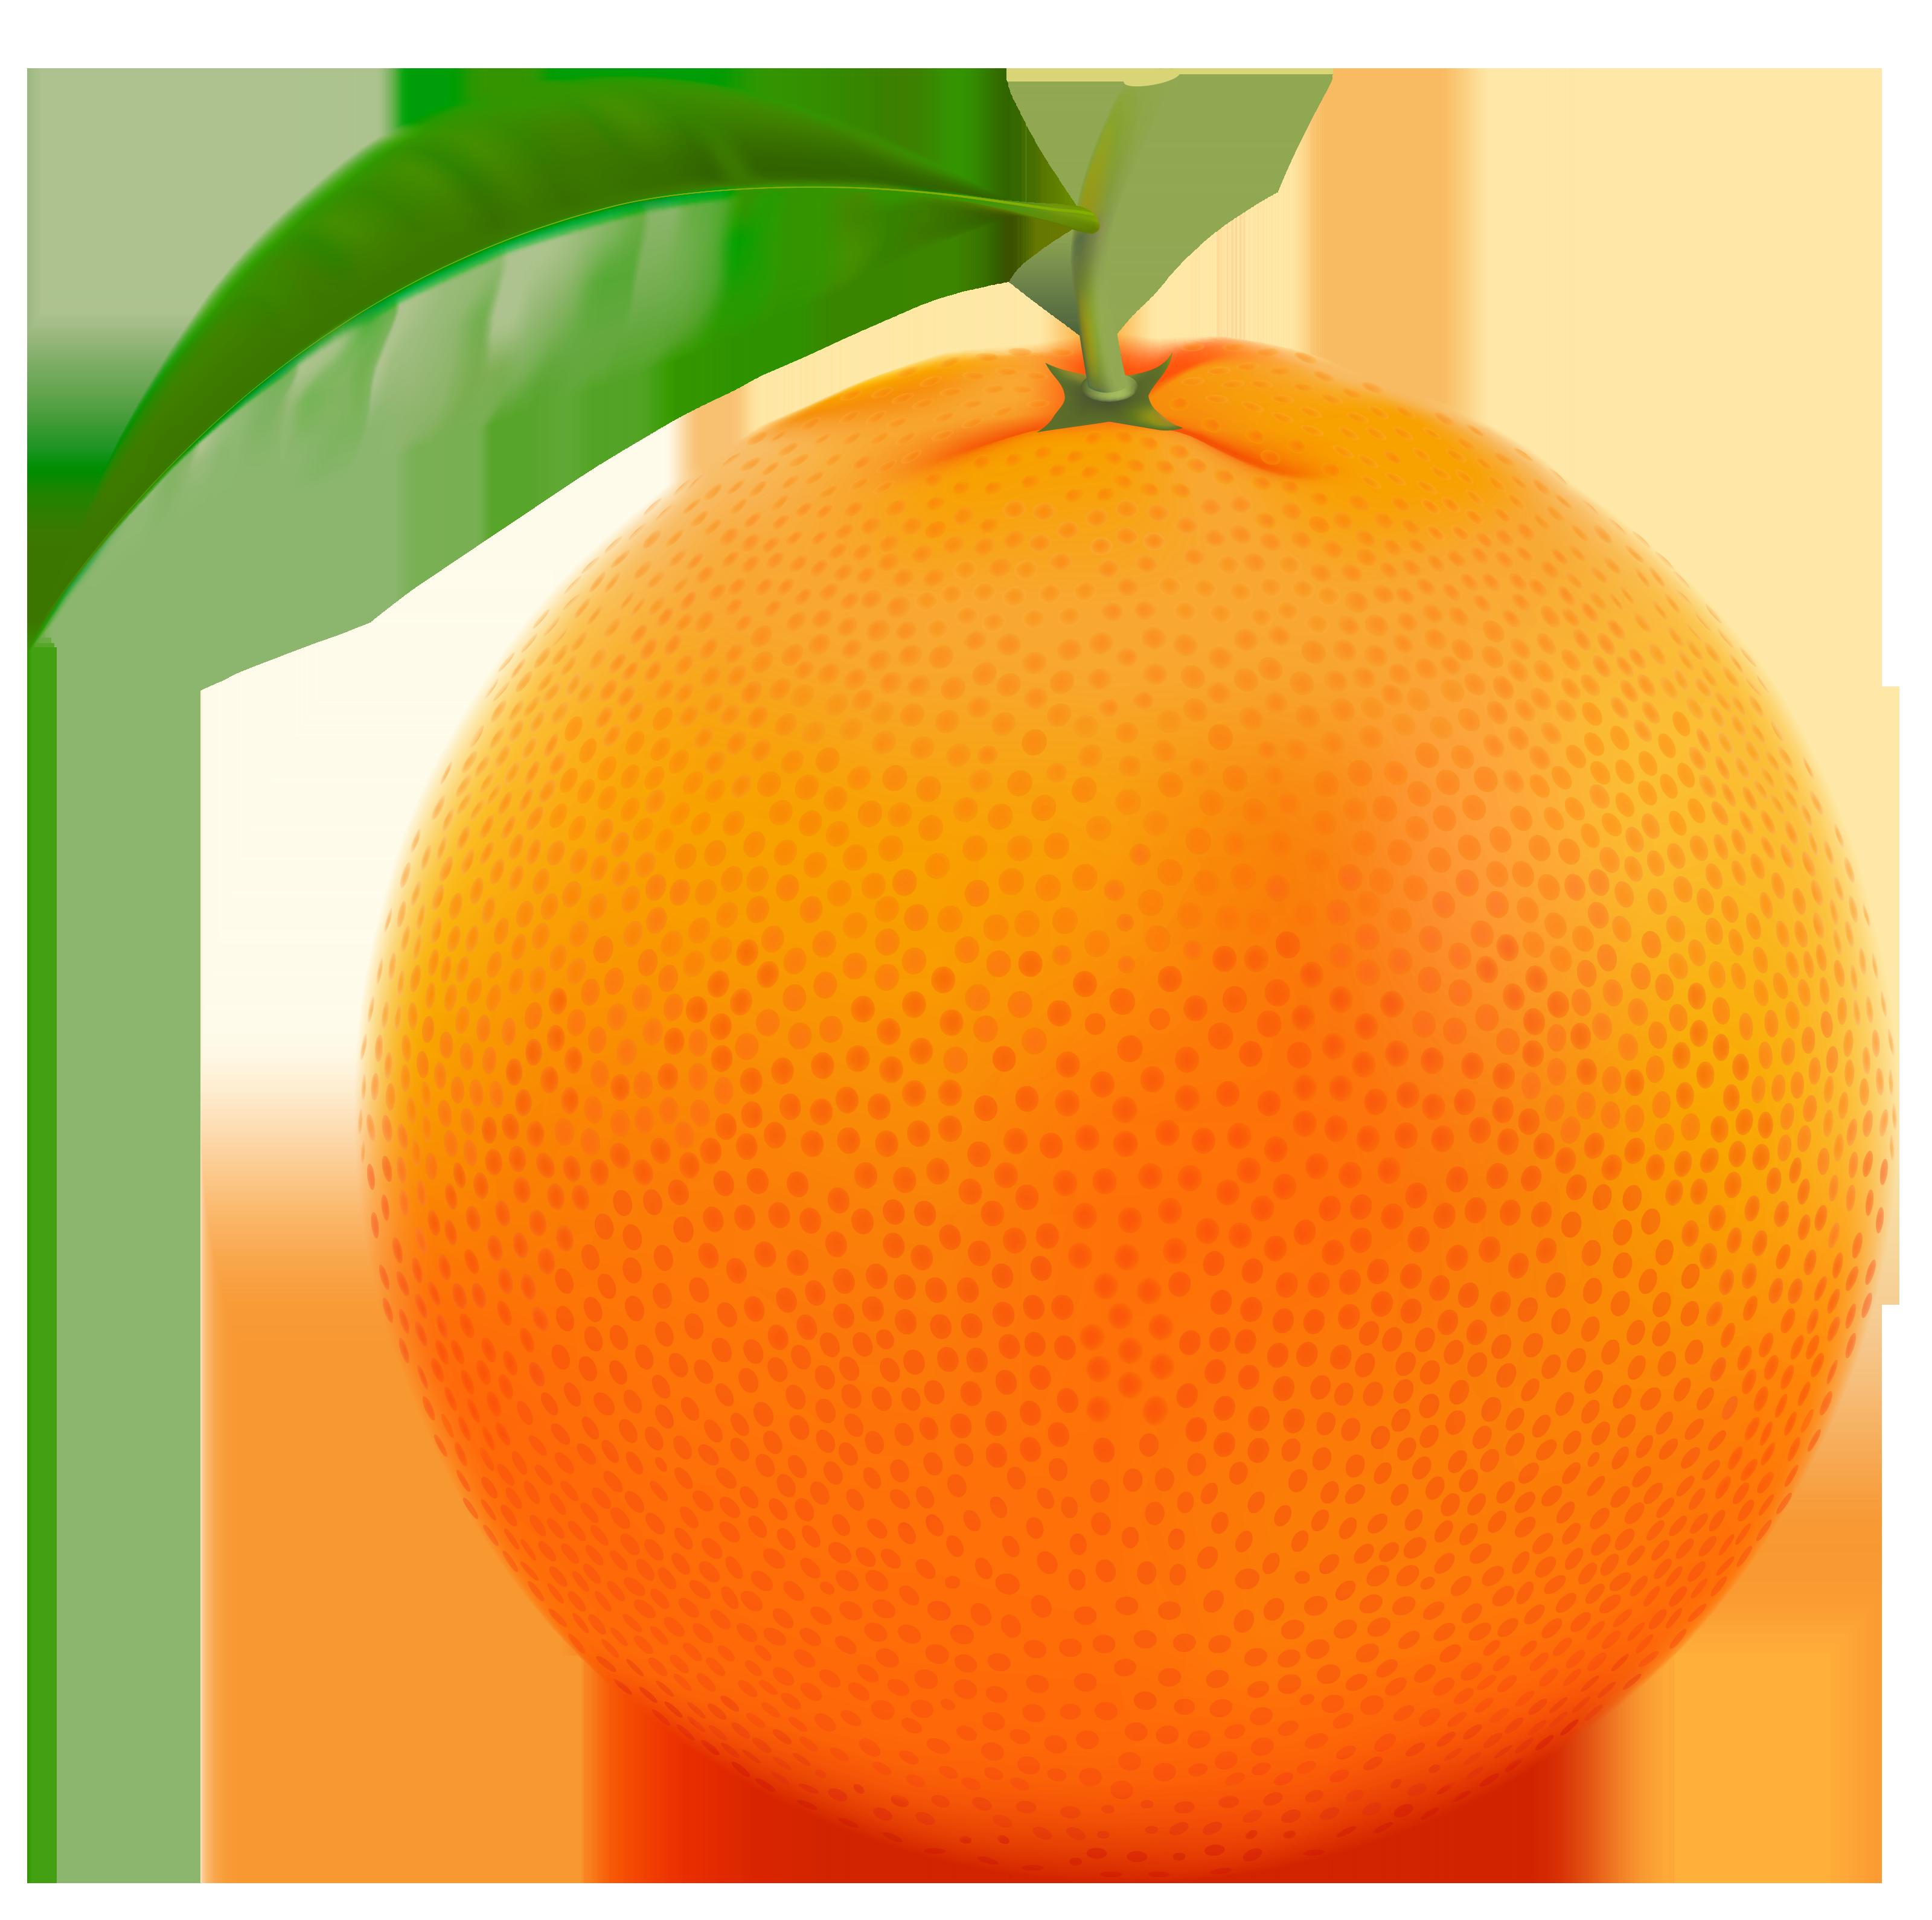 Fruit clipart kid. Red orange png vector